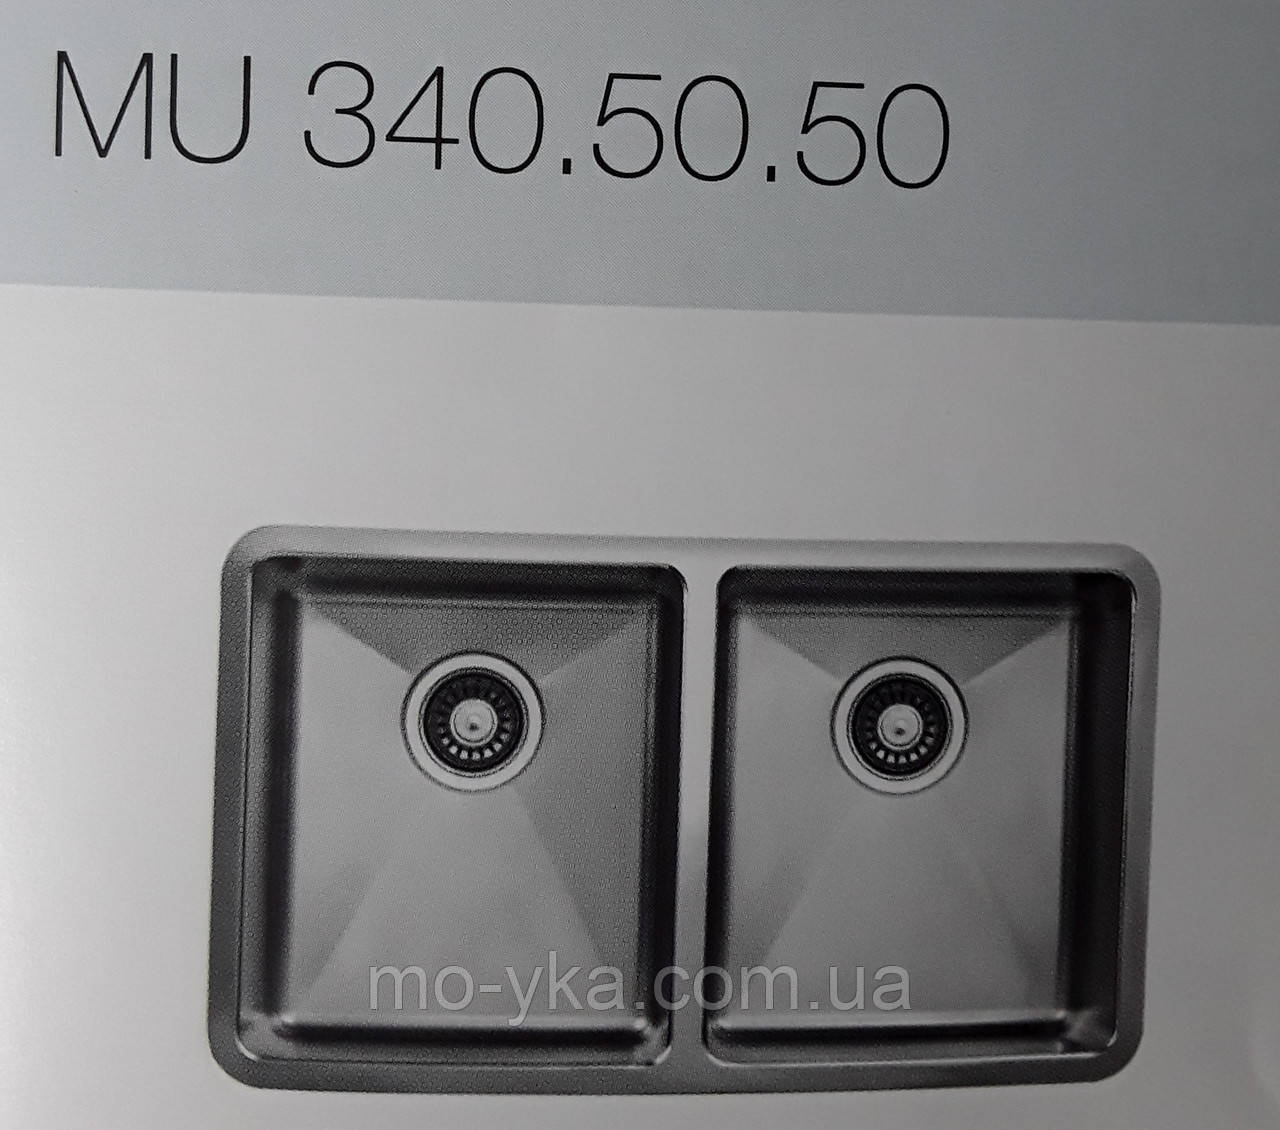 Кухонная мойка Ukinox Micro MU 340.50.50